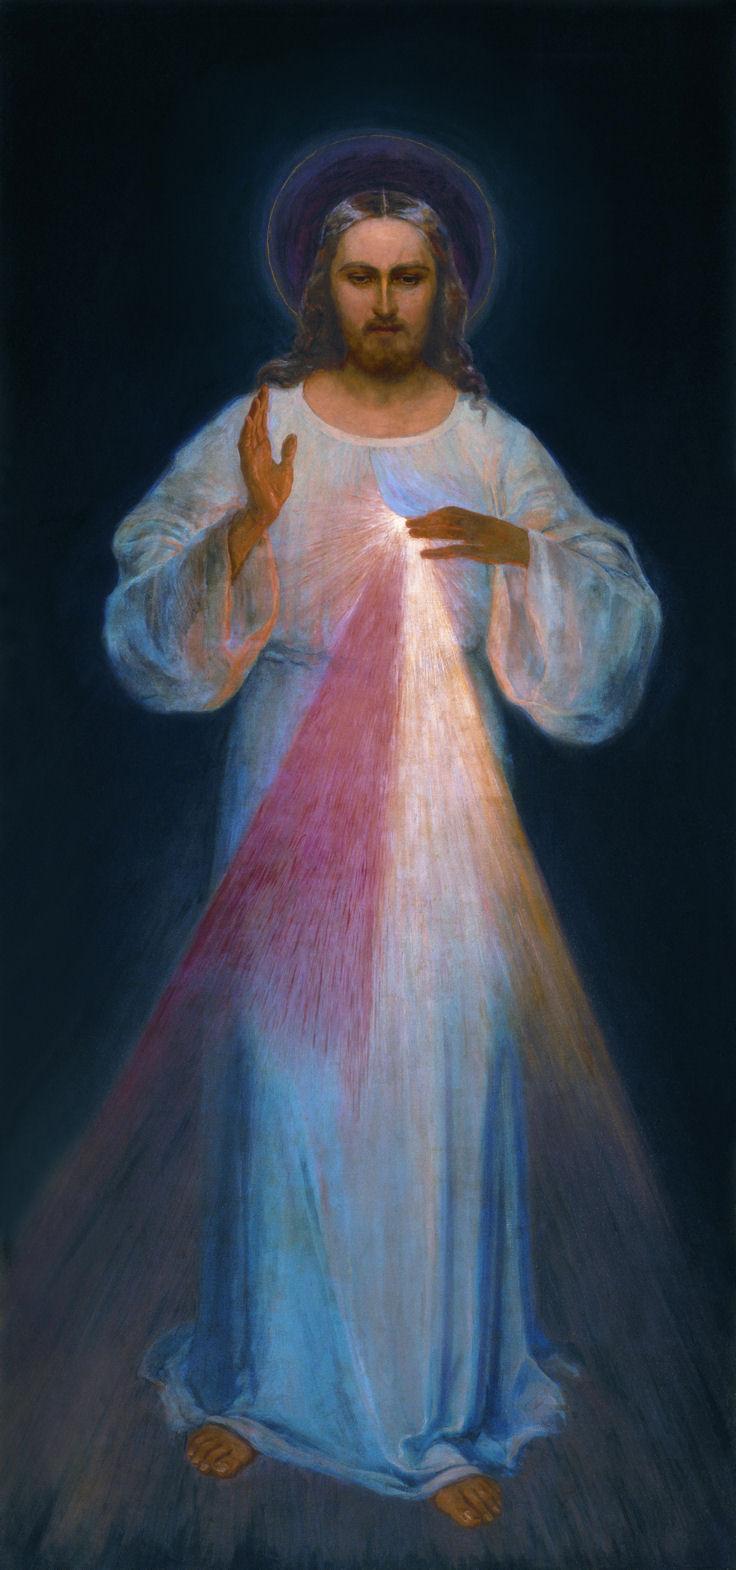 ORIGINAL Kazimirowski_Eugeniusz,_Divine_Mercy,_1934.jpg